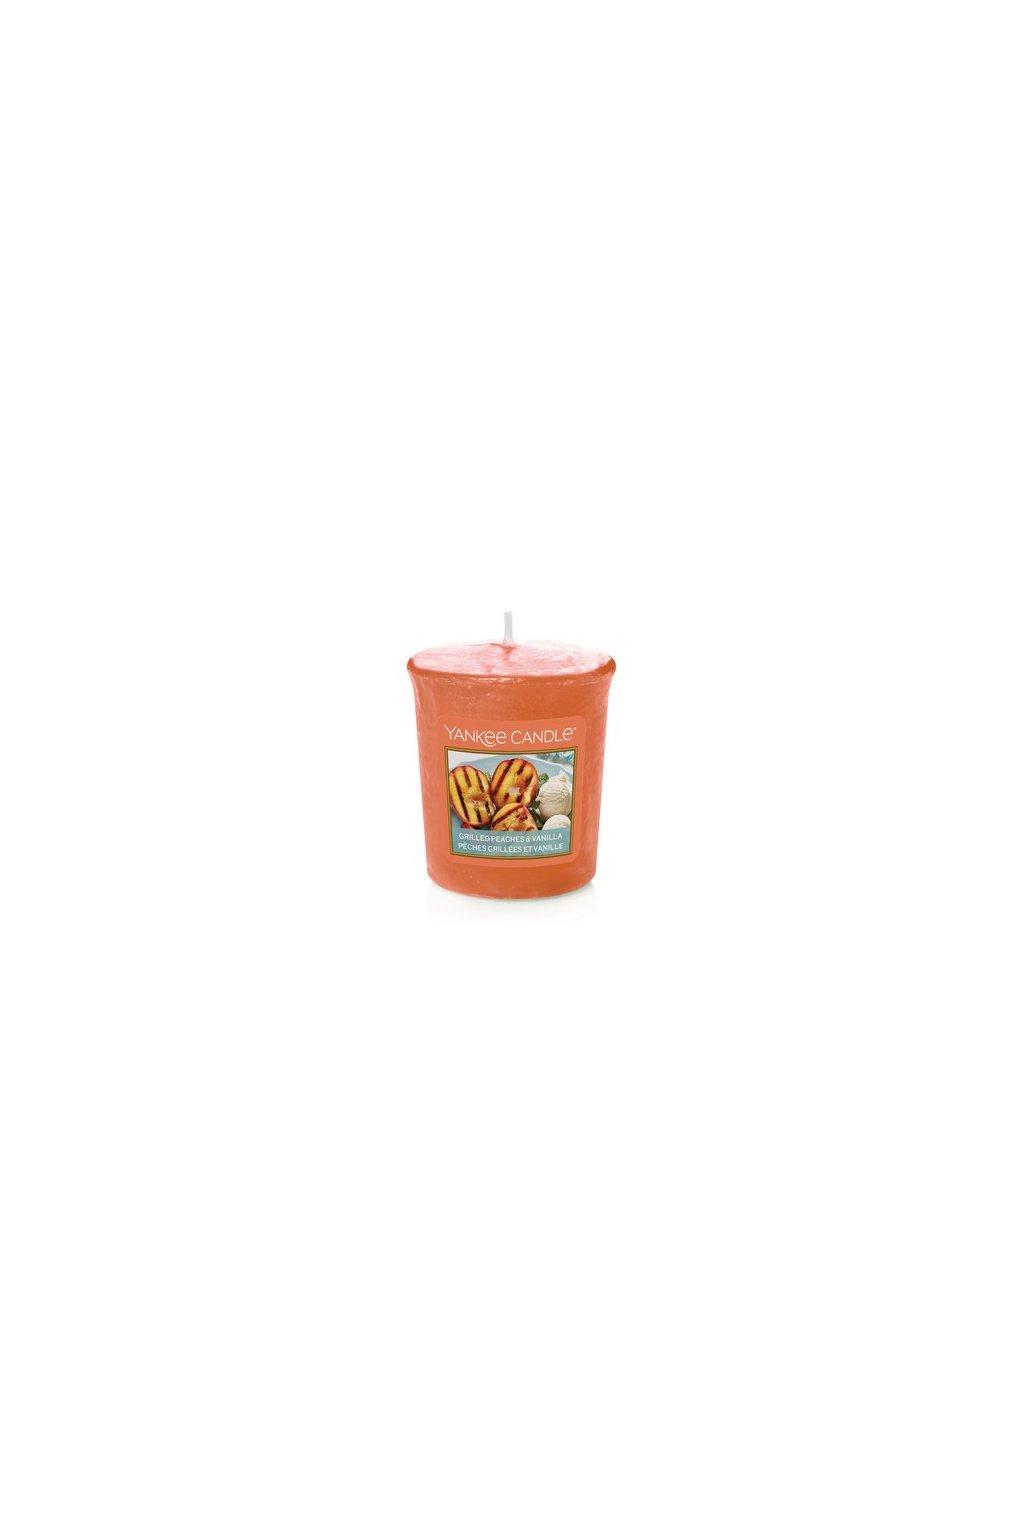 Yankee Candle Grilled Peaches & Vanila 49g